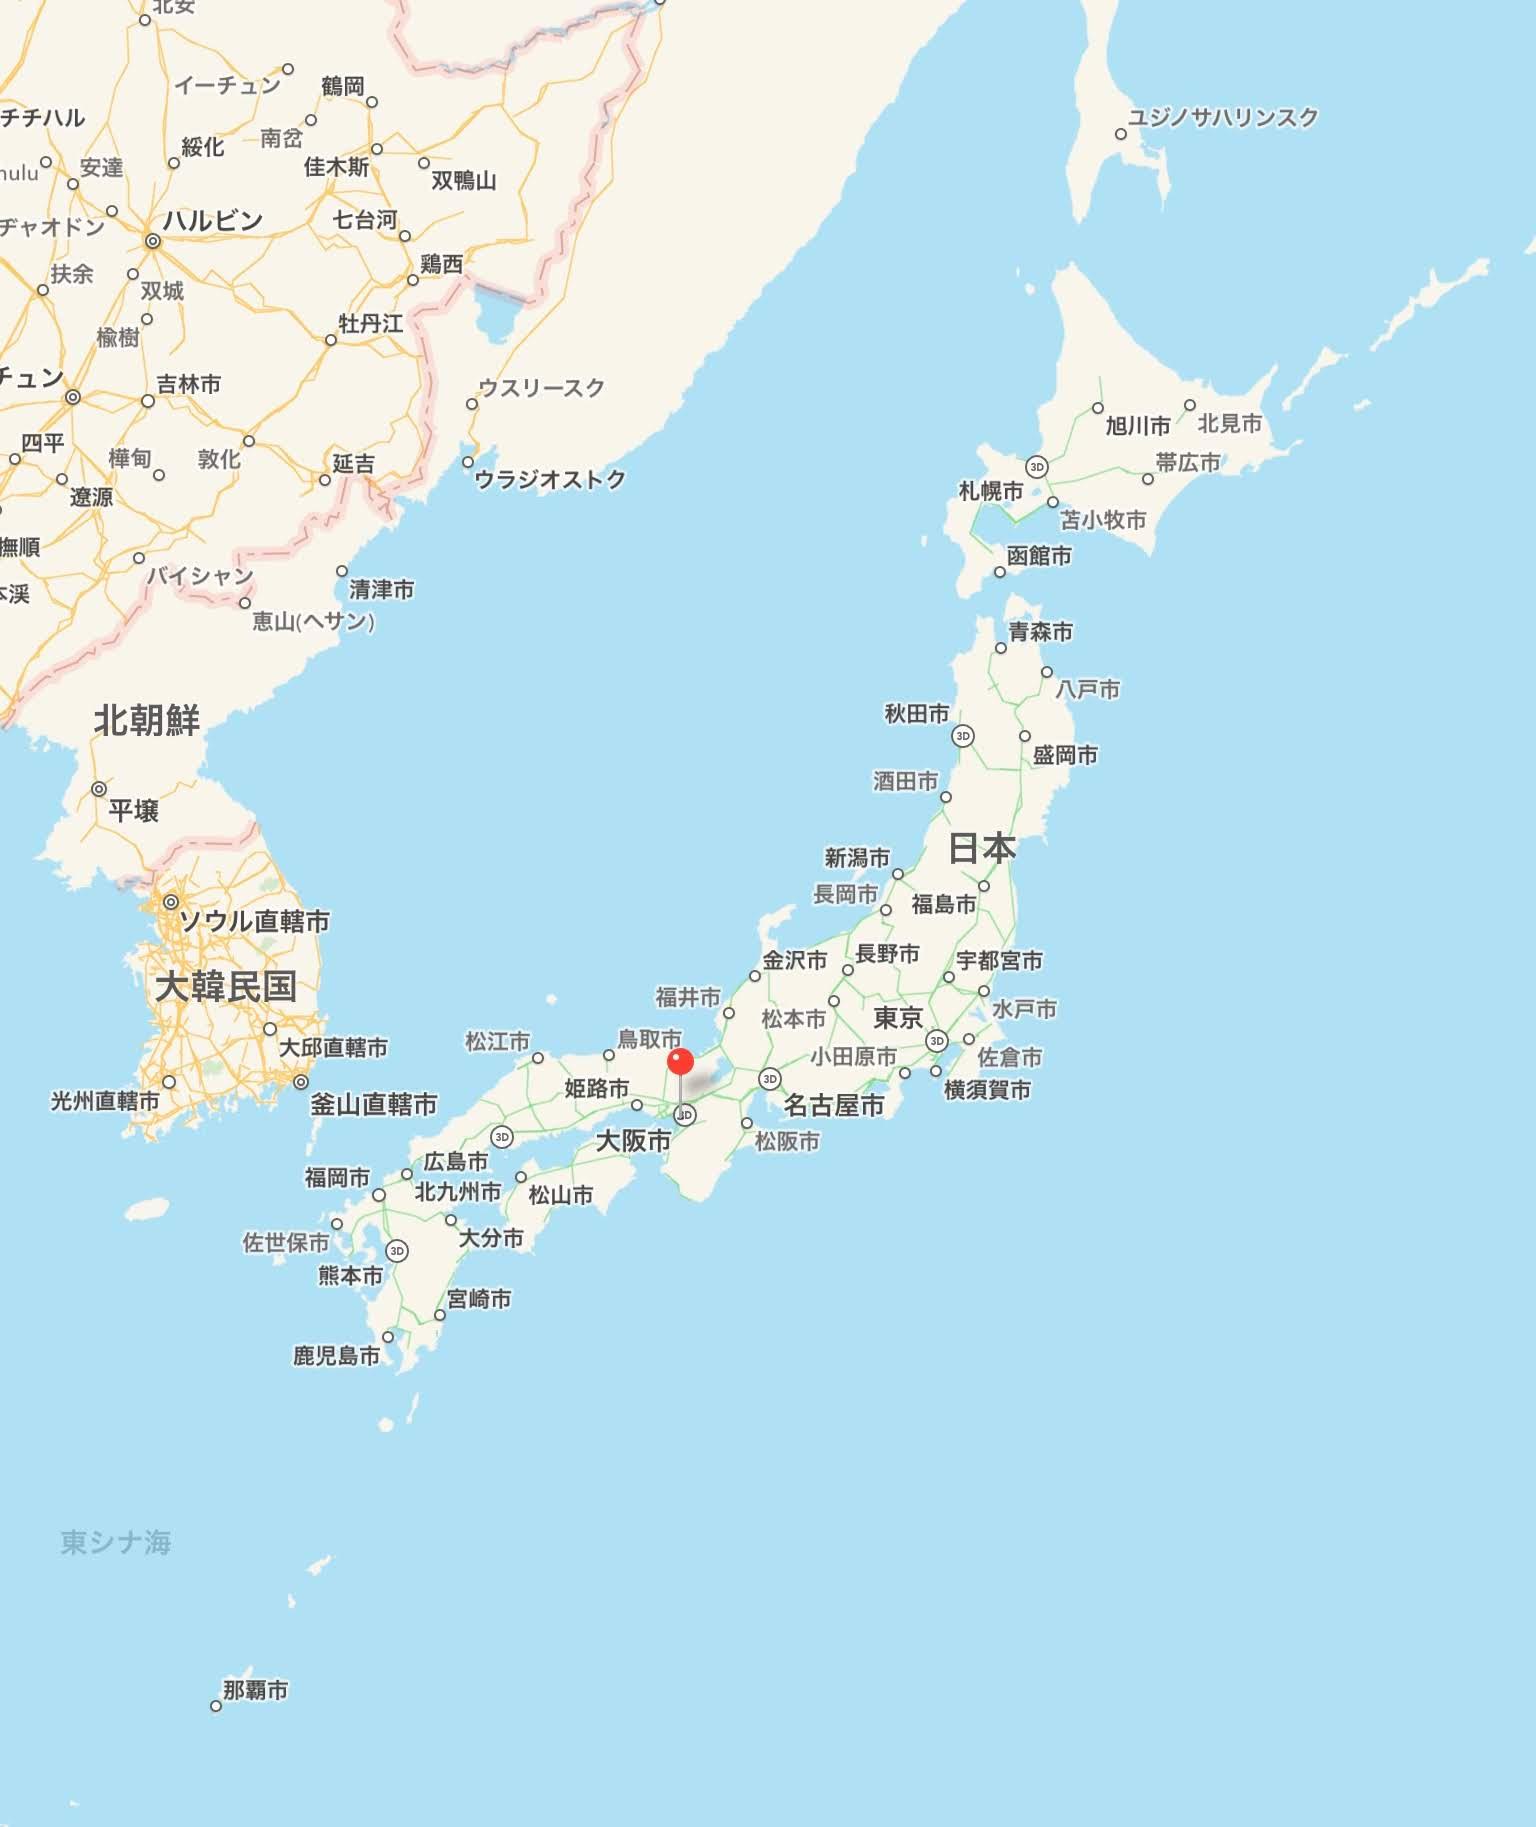 oosaka_chuo_taiikukan_map.JPG